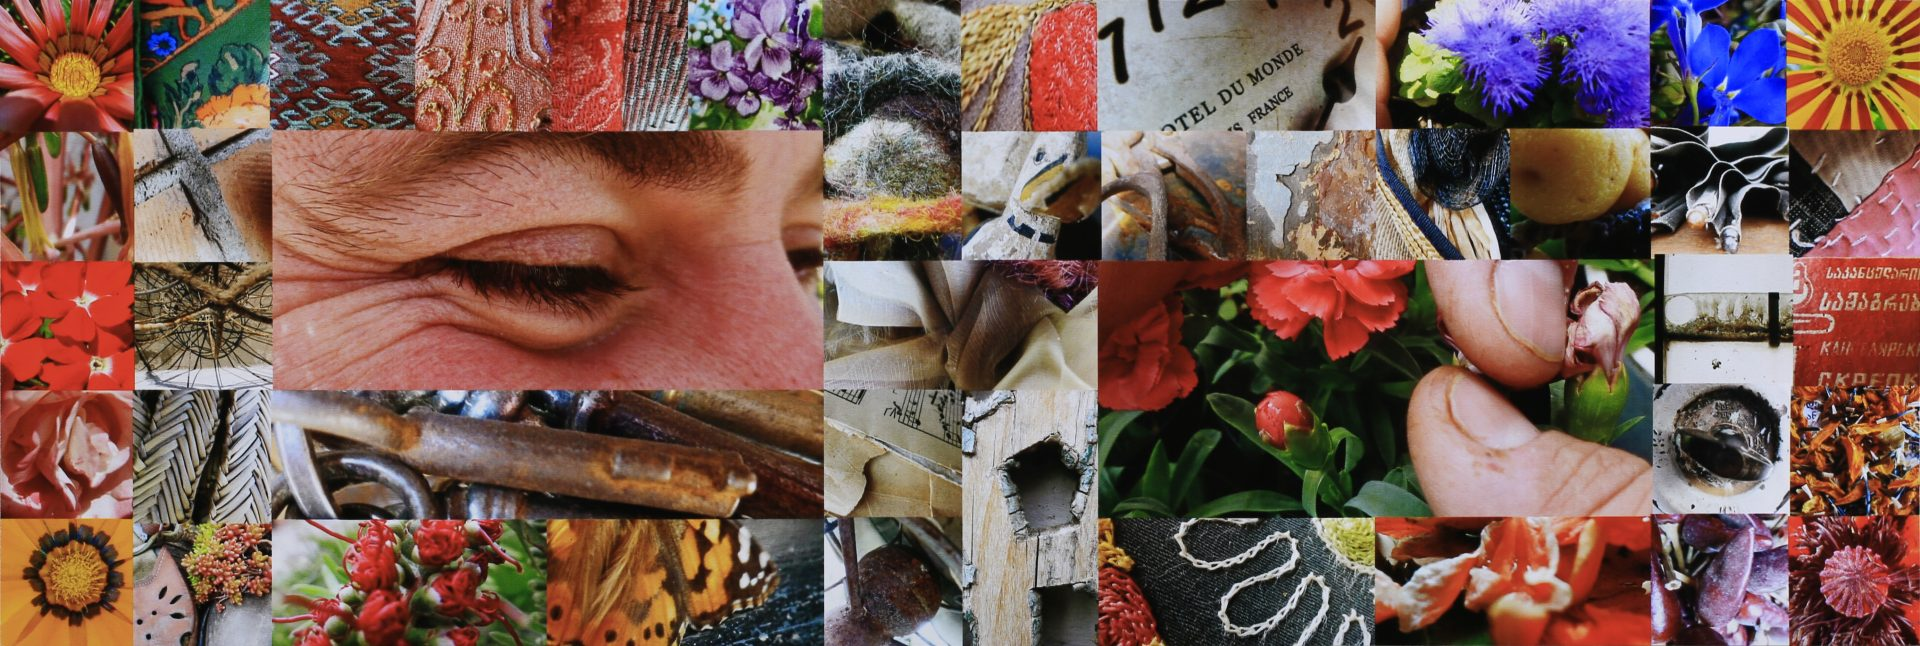 """Zurab"" - Tiflis 2013 -100 x 300 cm - Premium-Posterdruck"